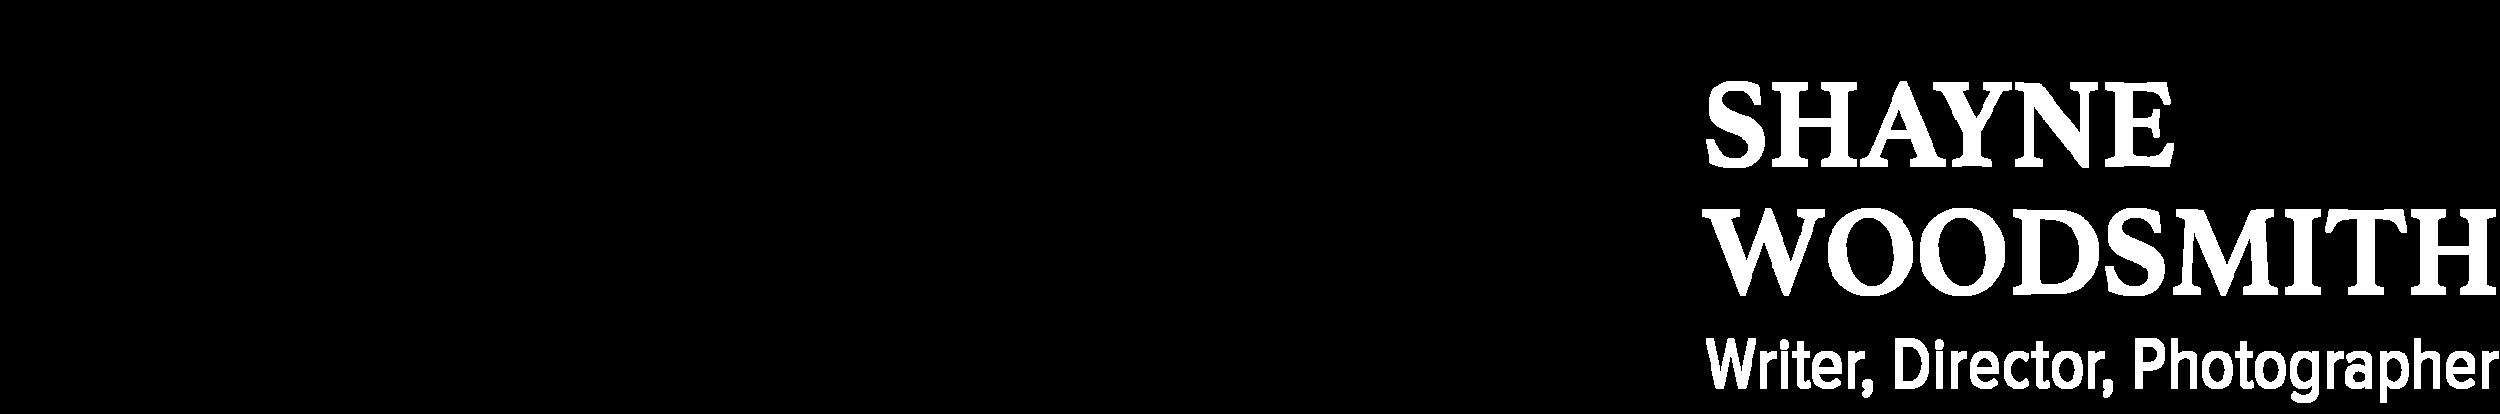 biopicNEW2-01-01-01-01.png